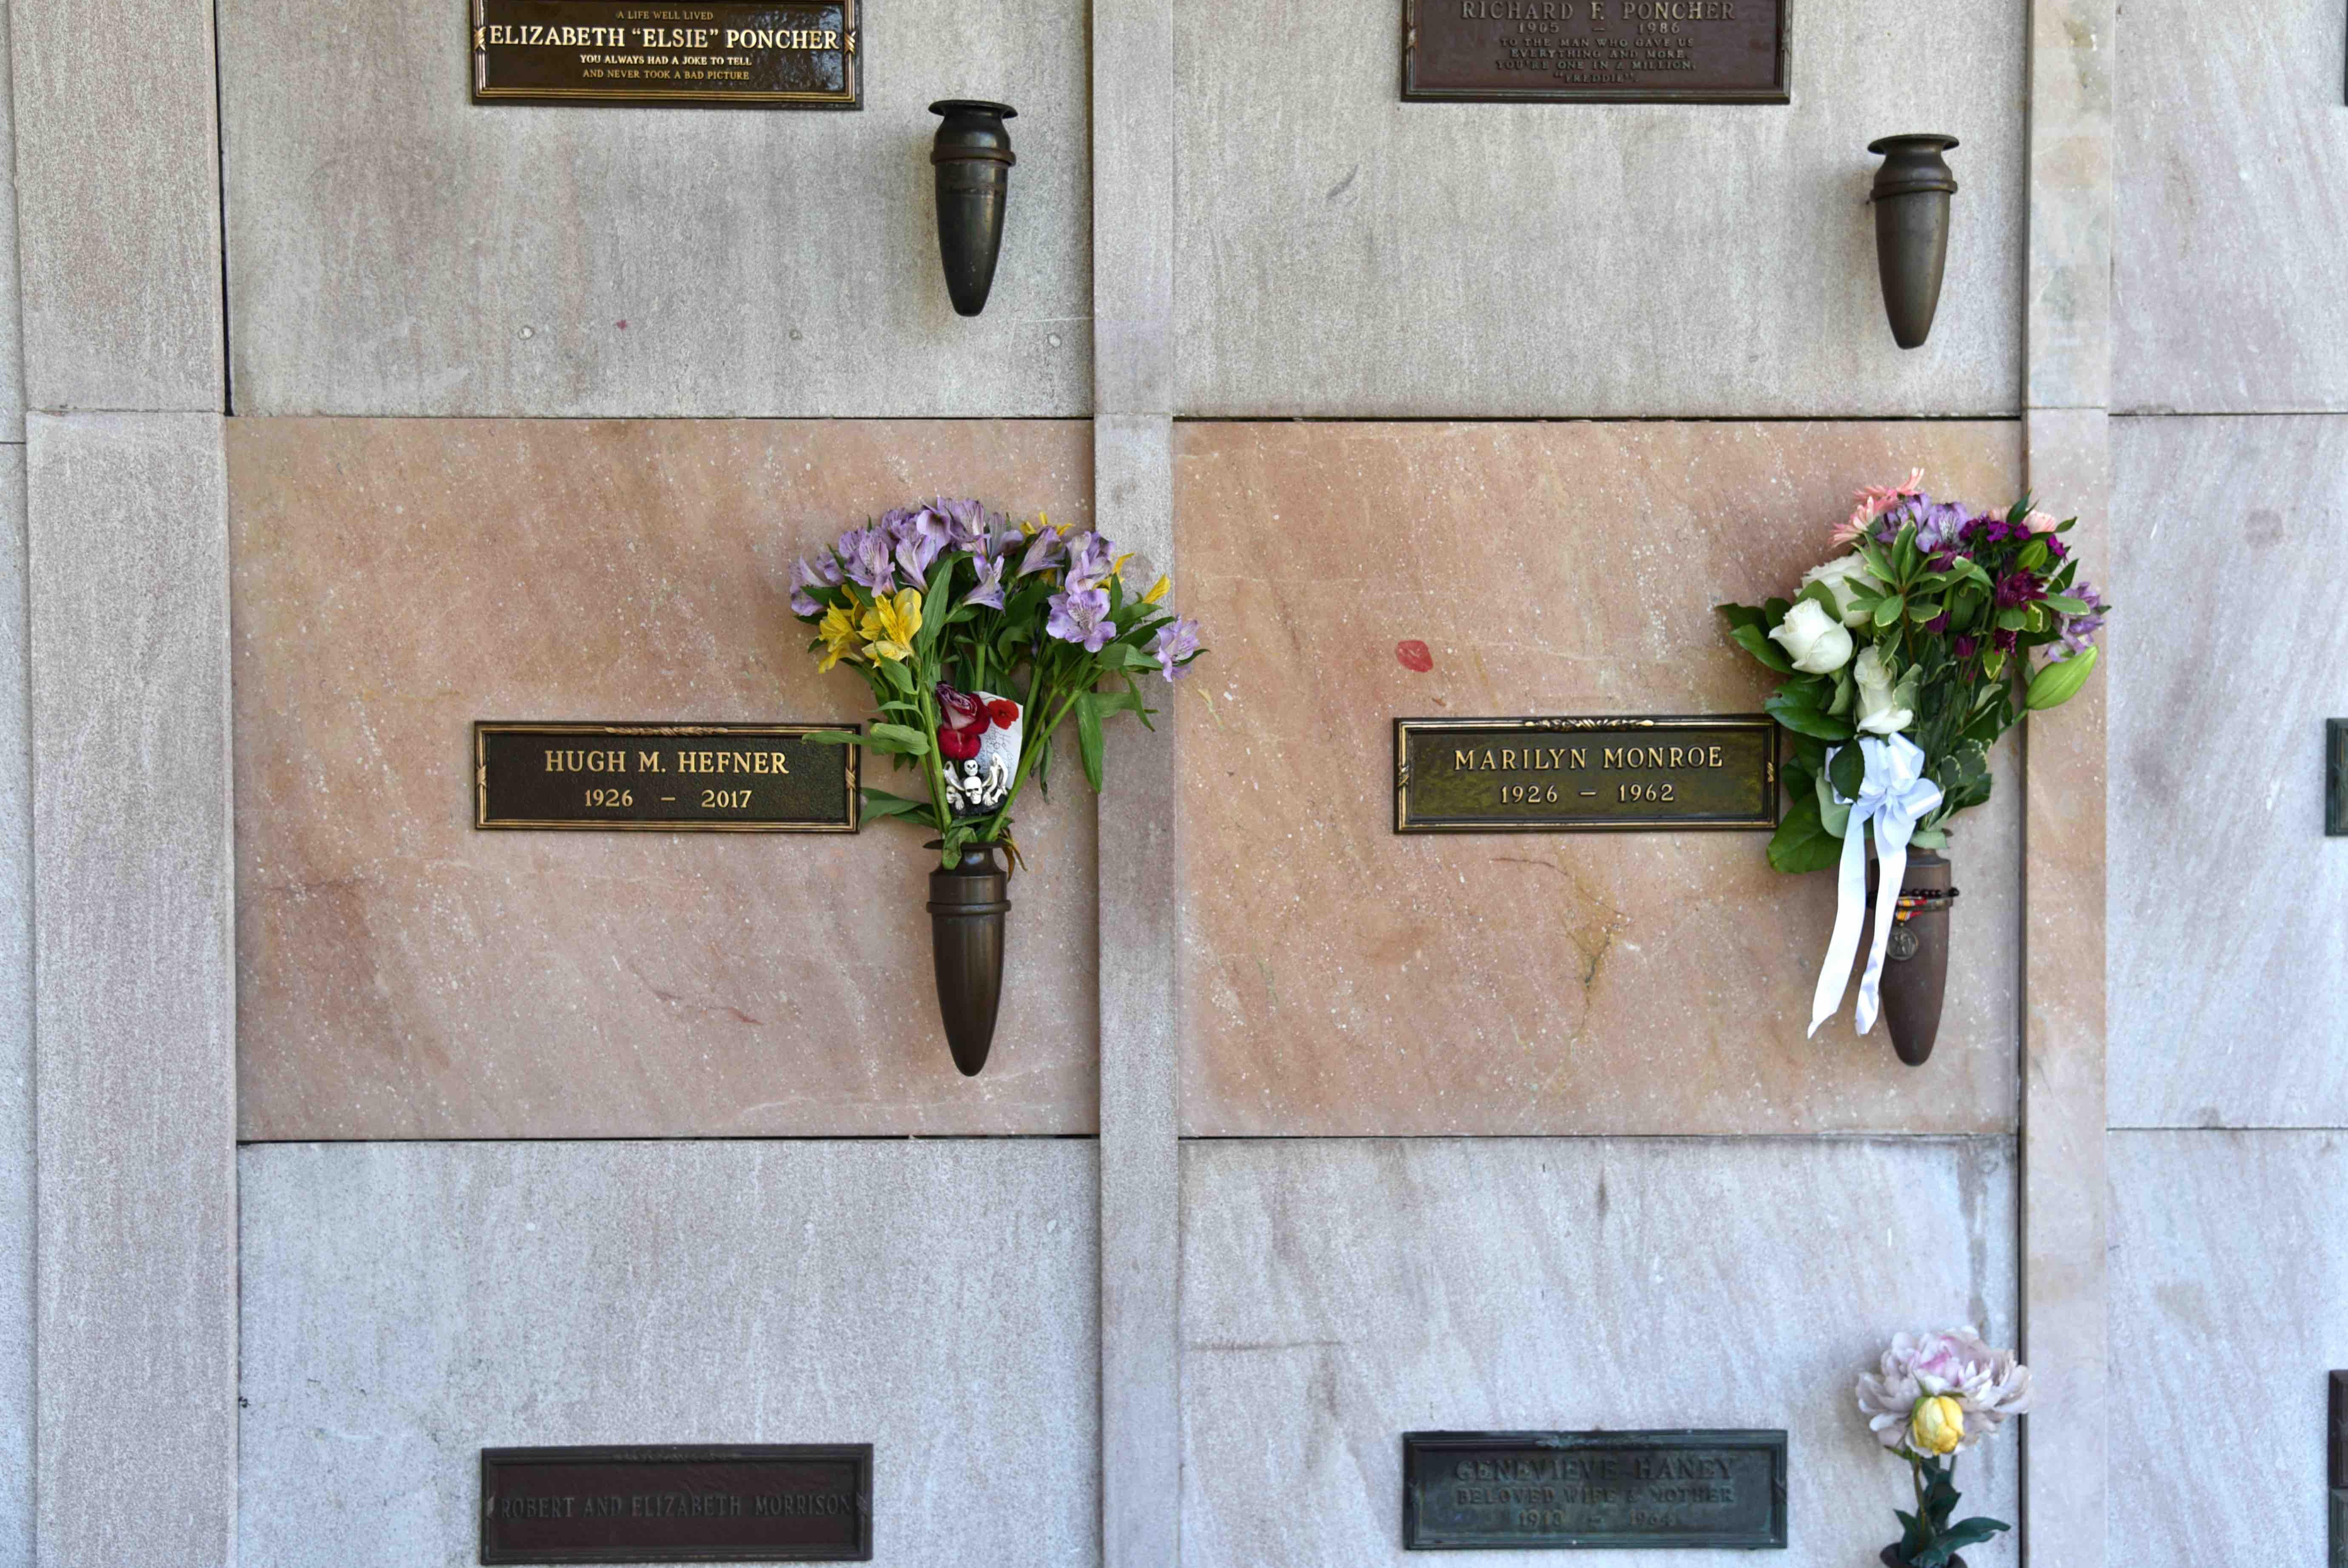 Marilyn Monroe memorial